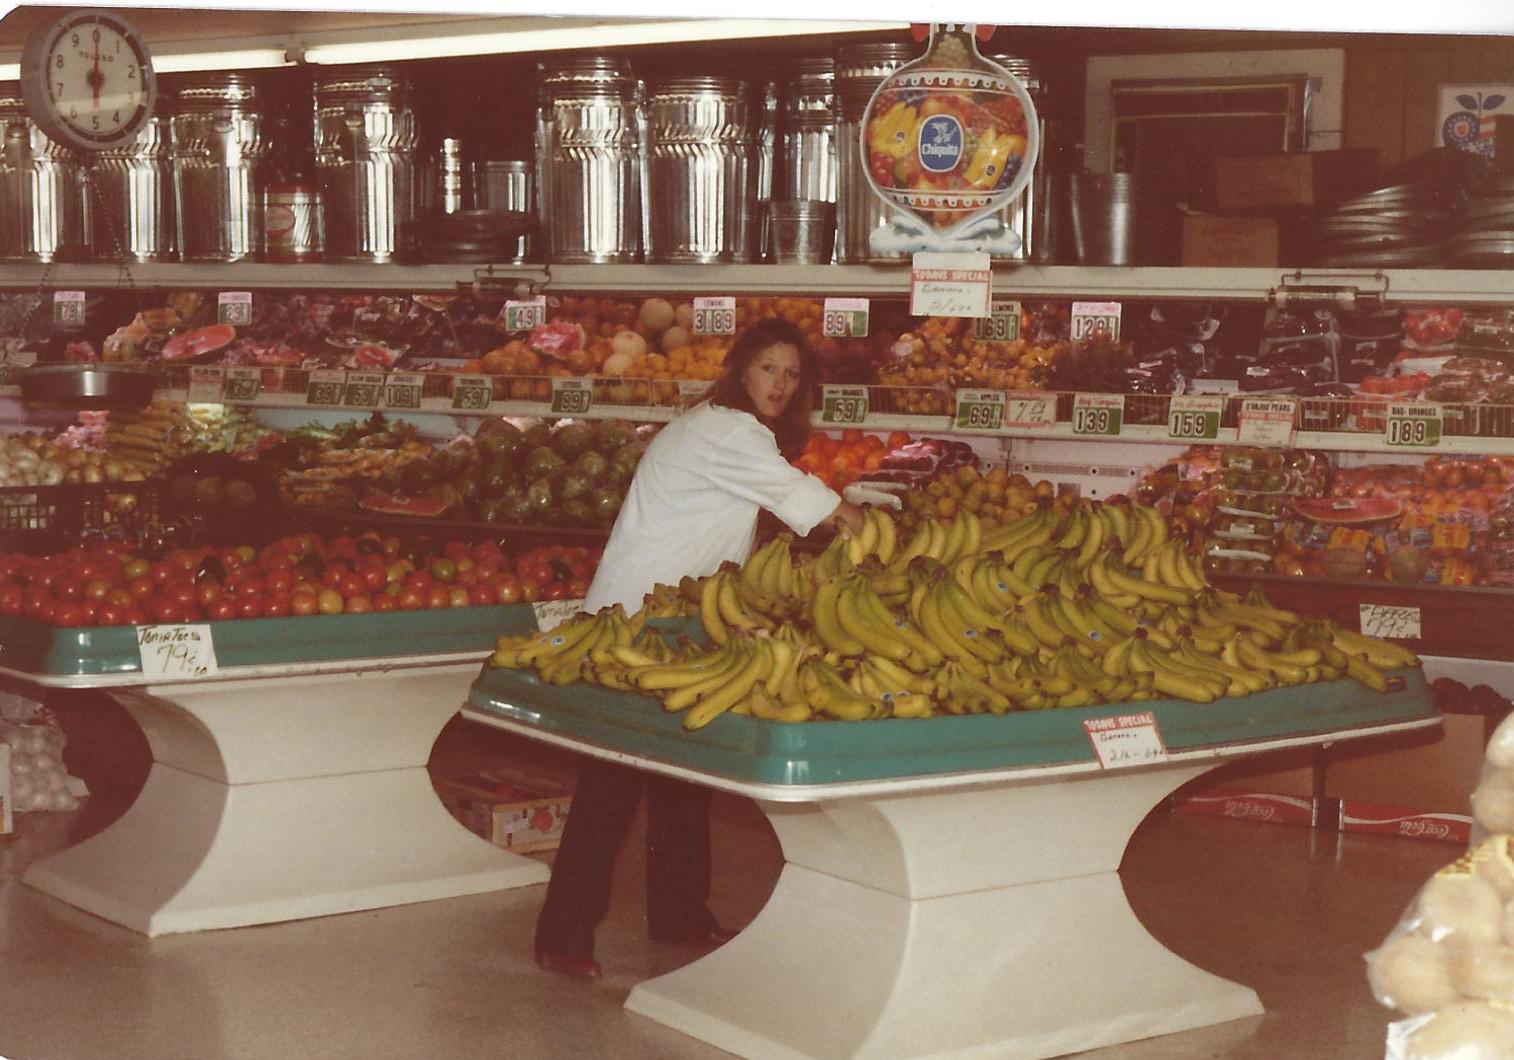 larproduce